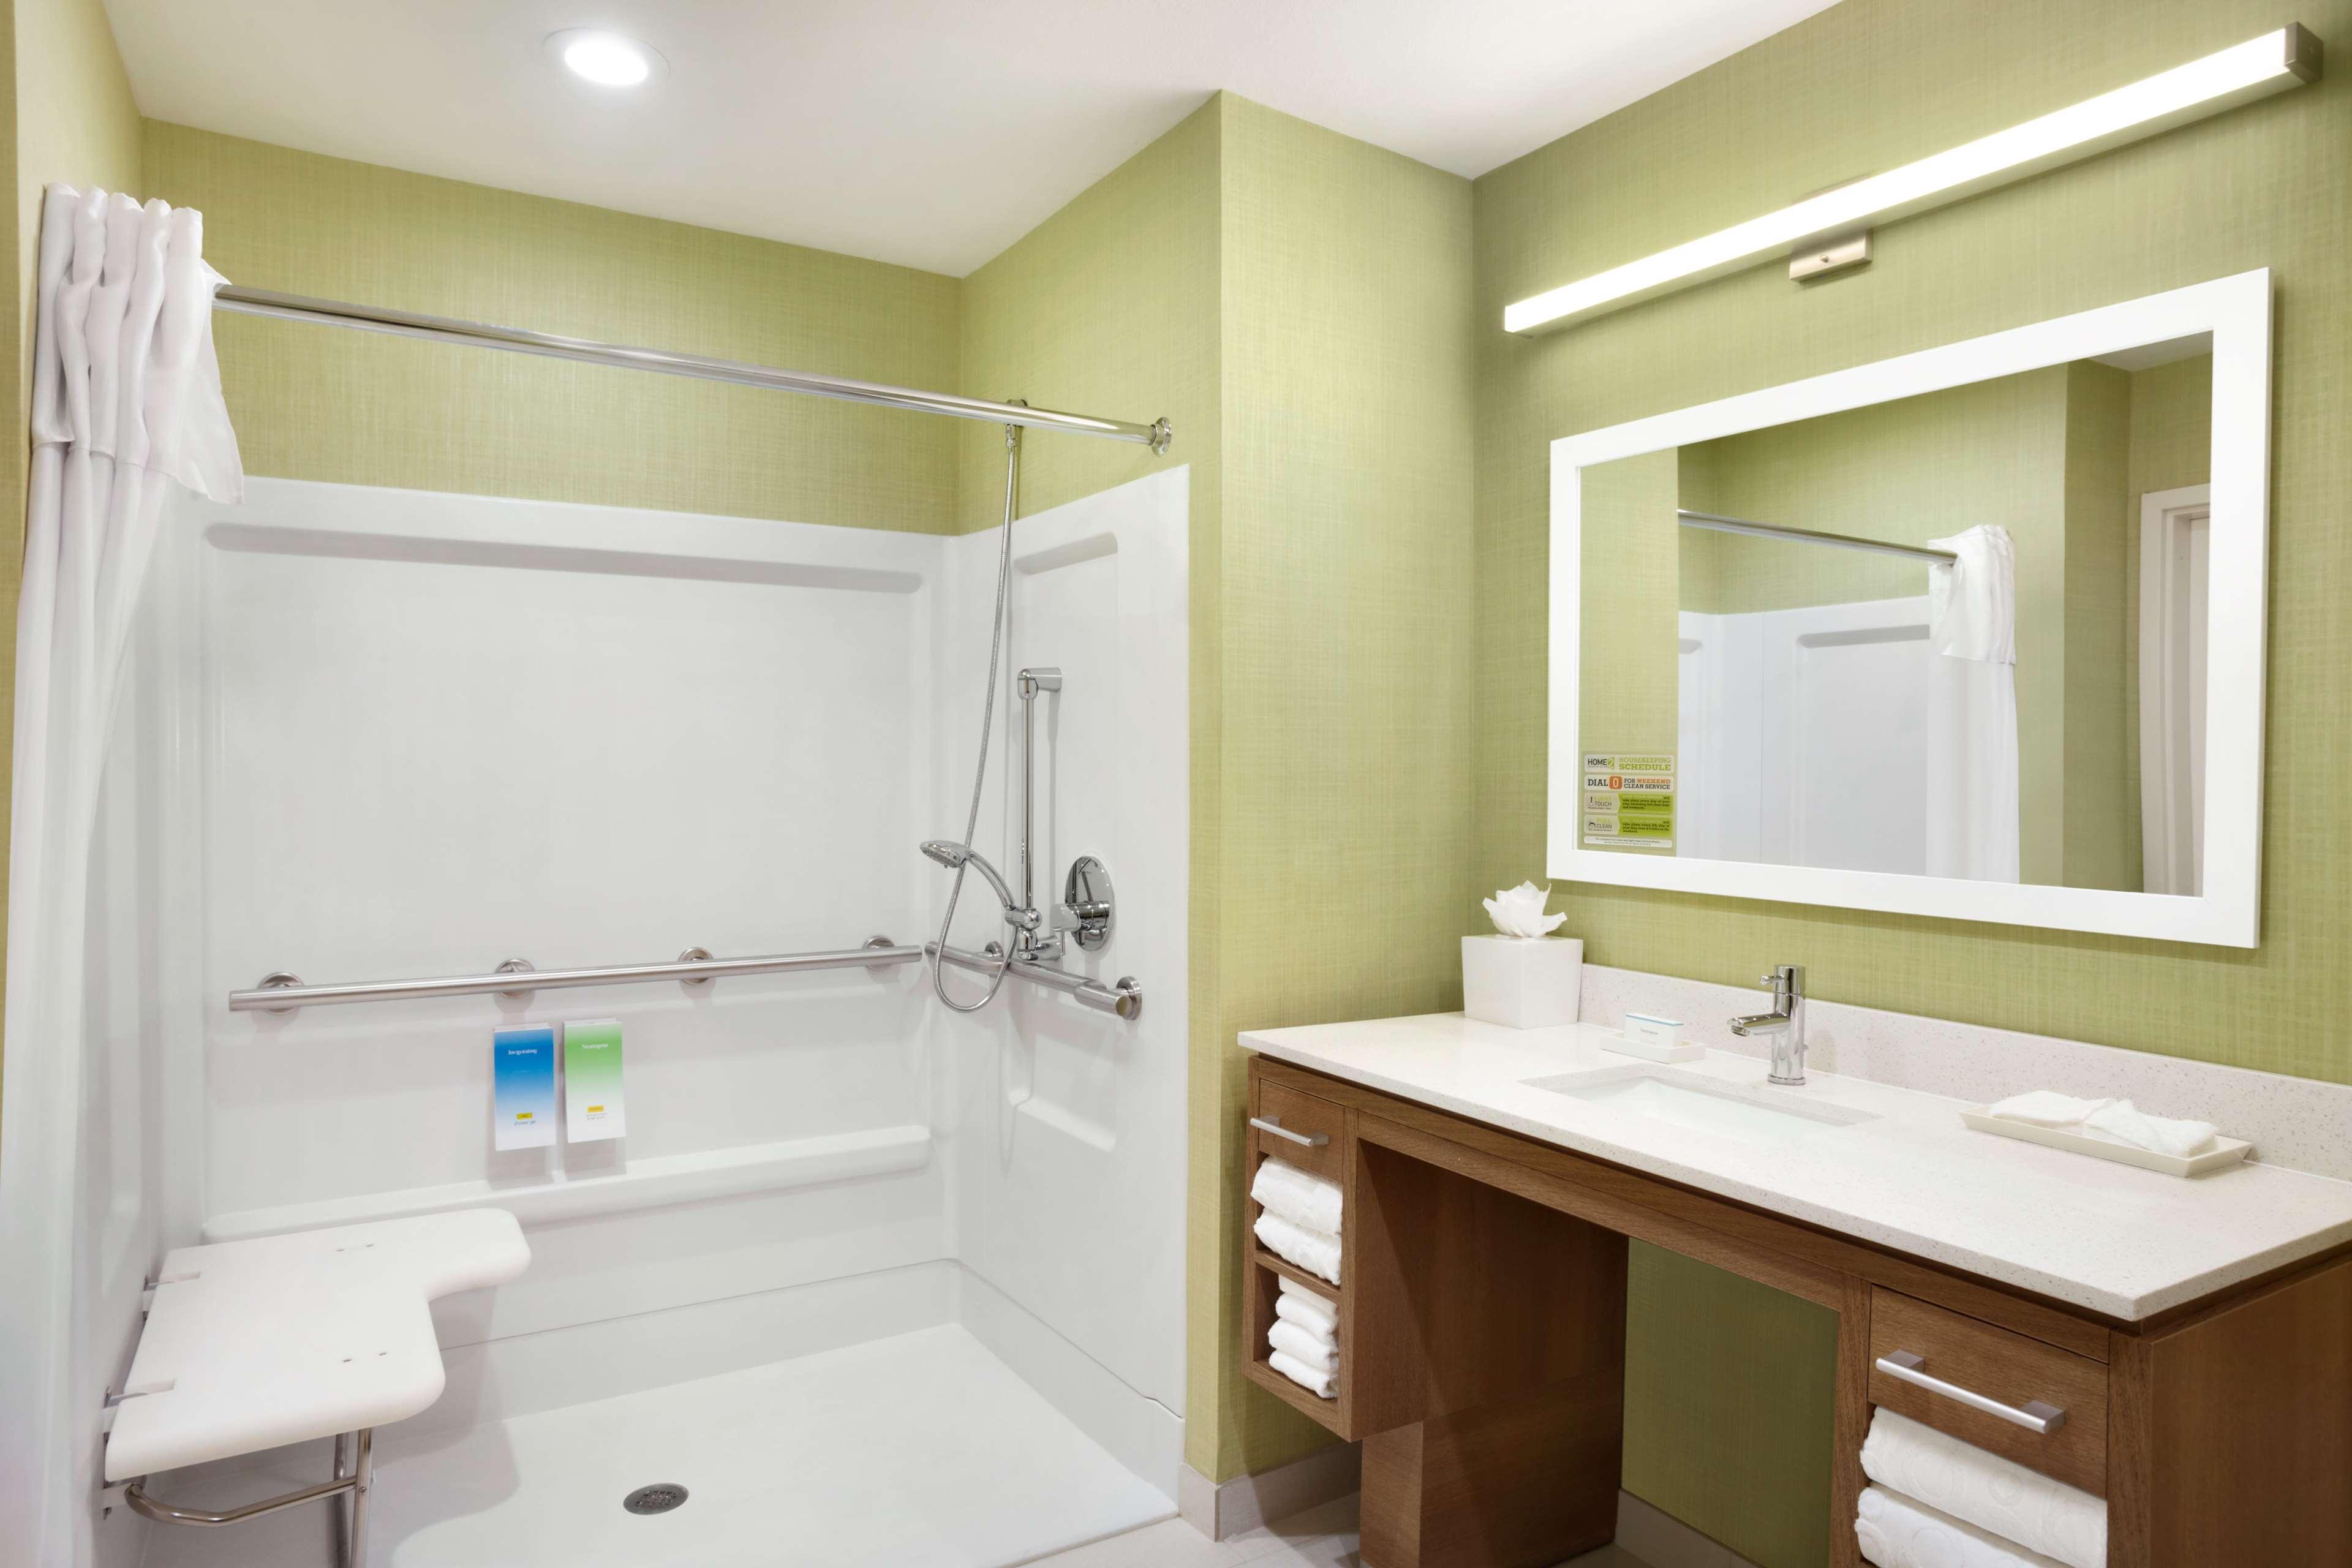 Home2 Suites by Hilton Houston/Webster image 17